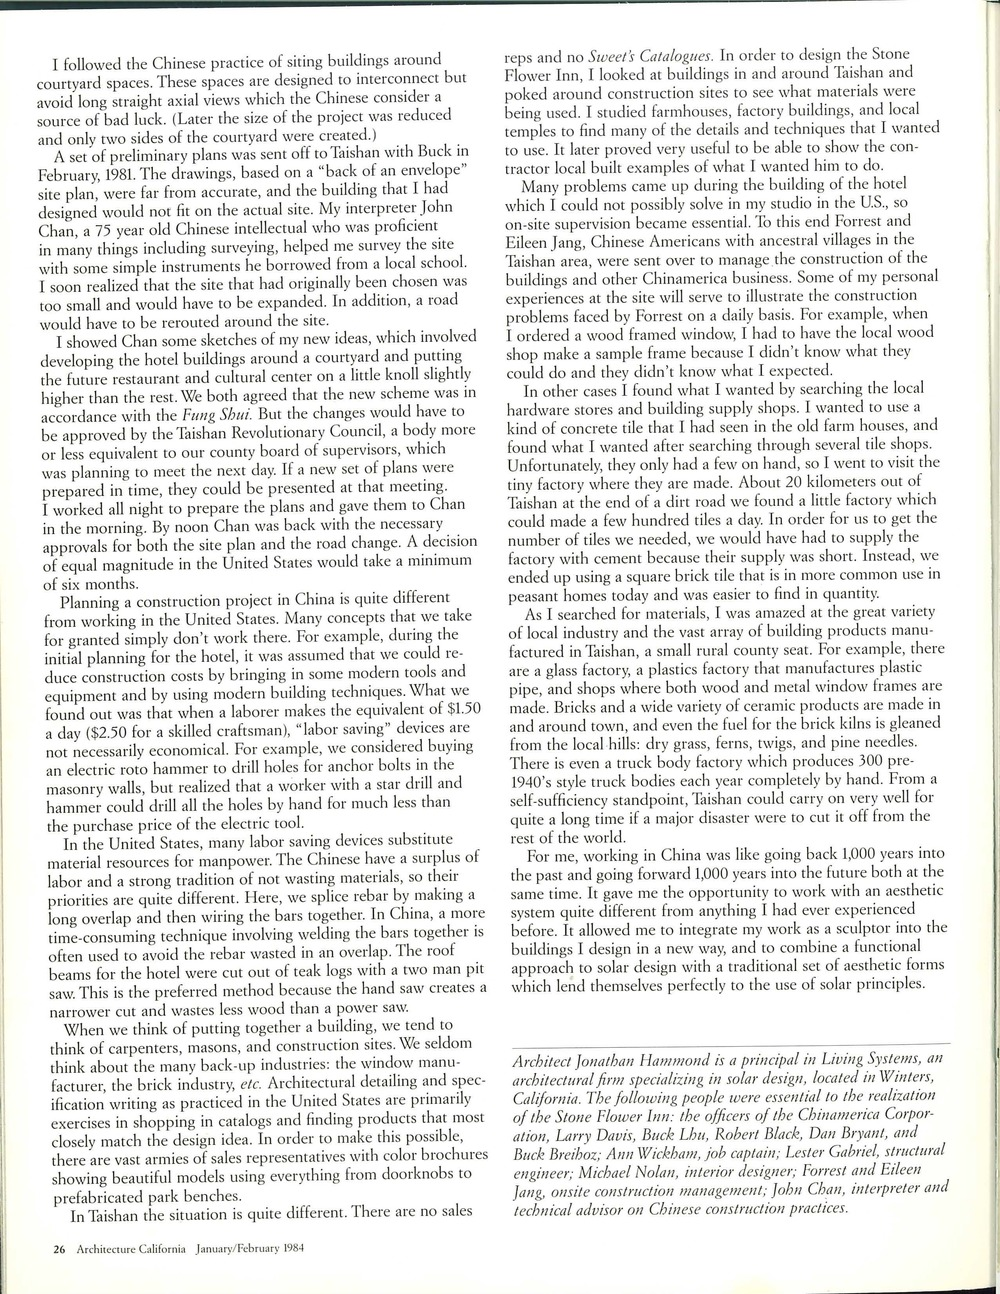 architecture california_1984_Page_6.jpg